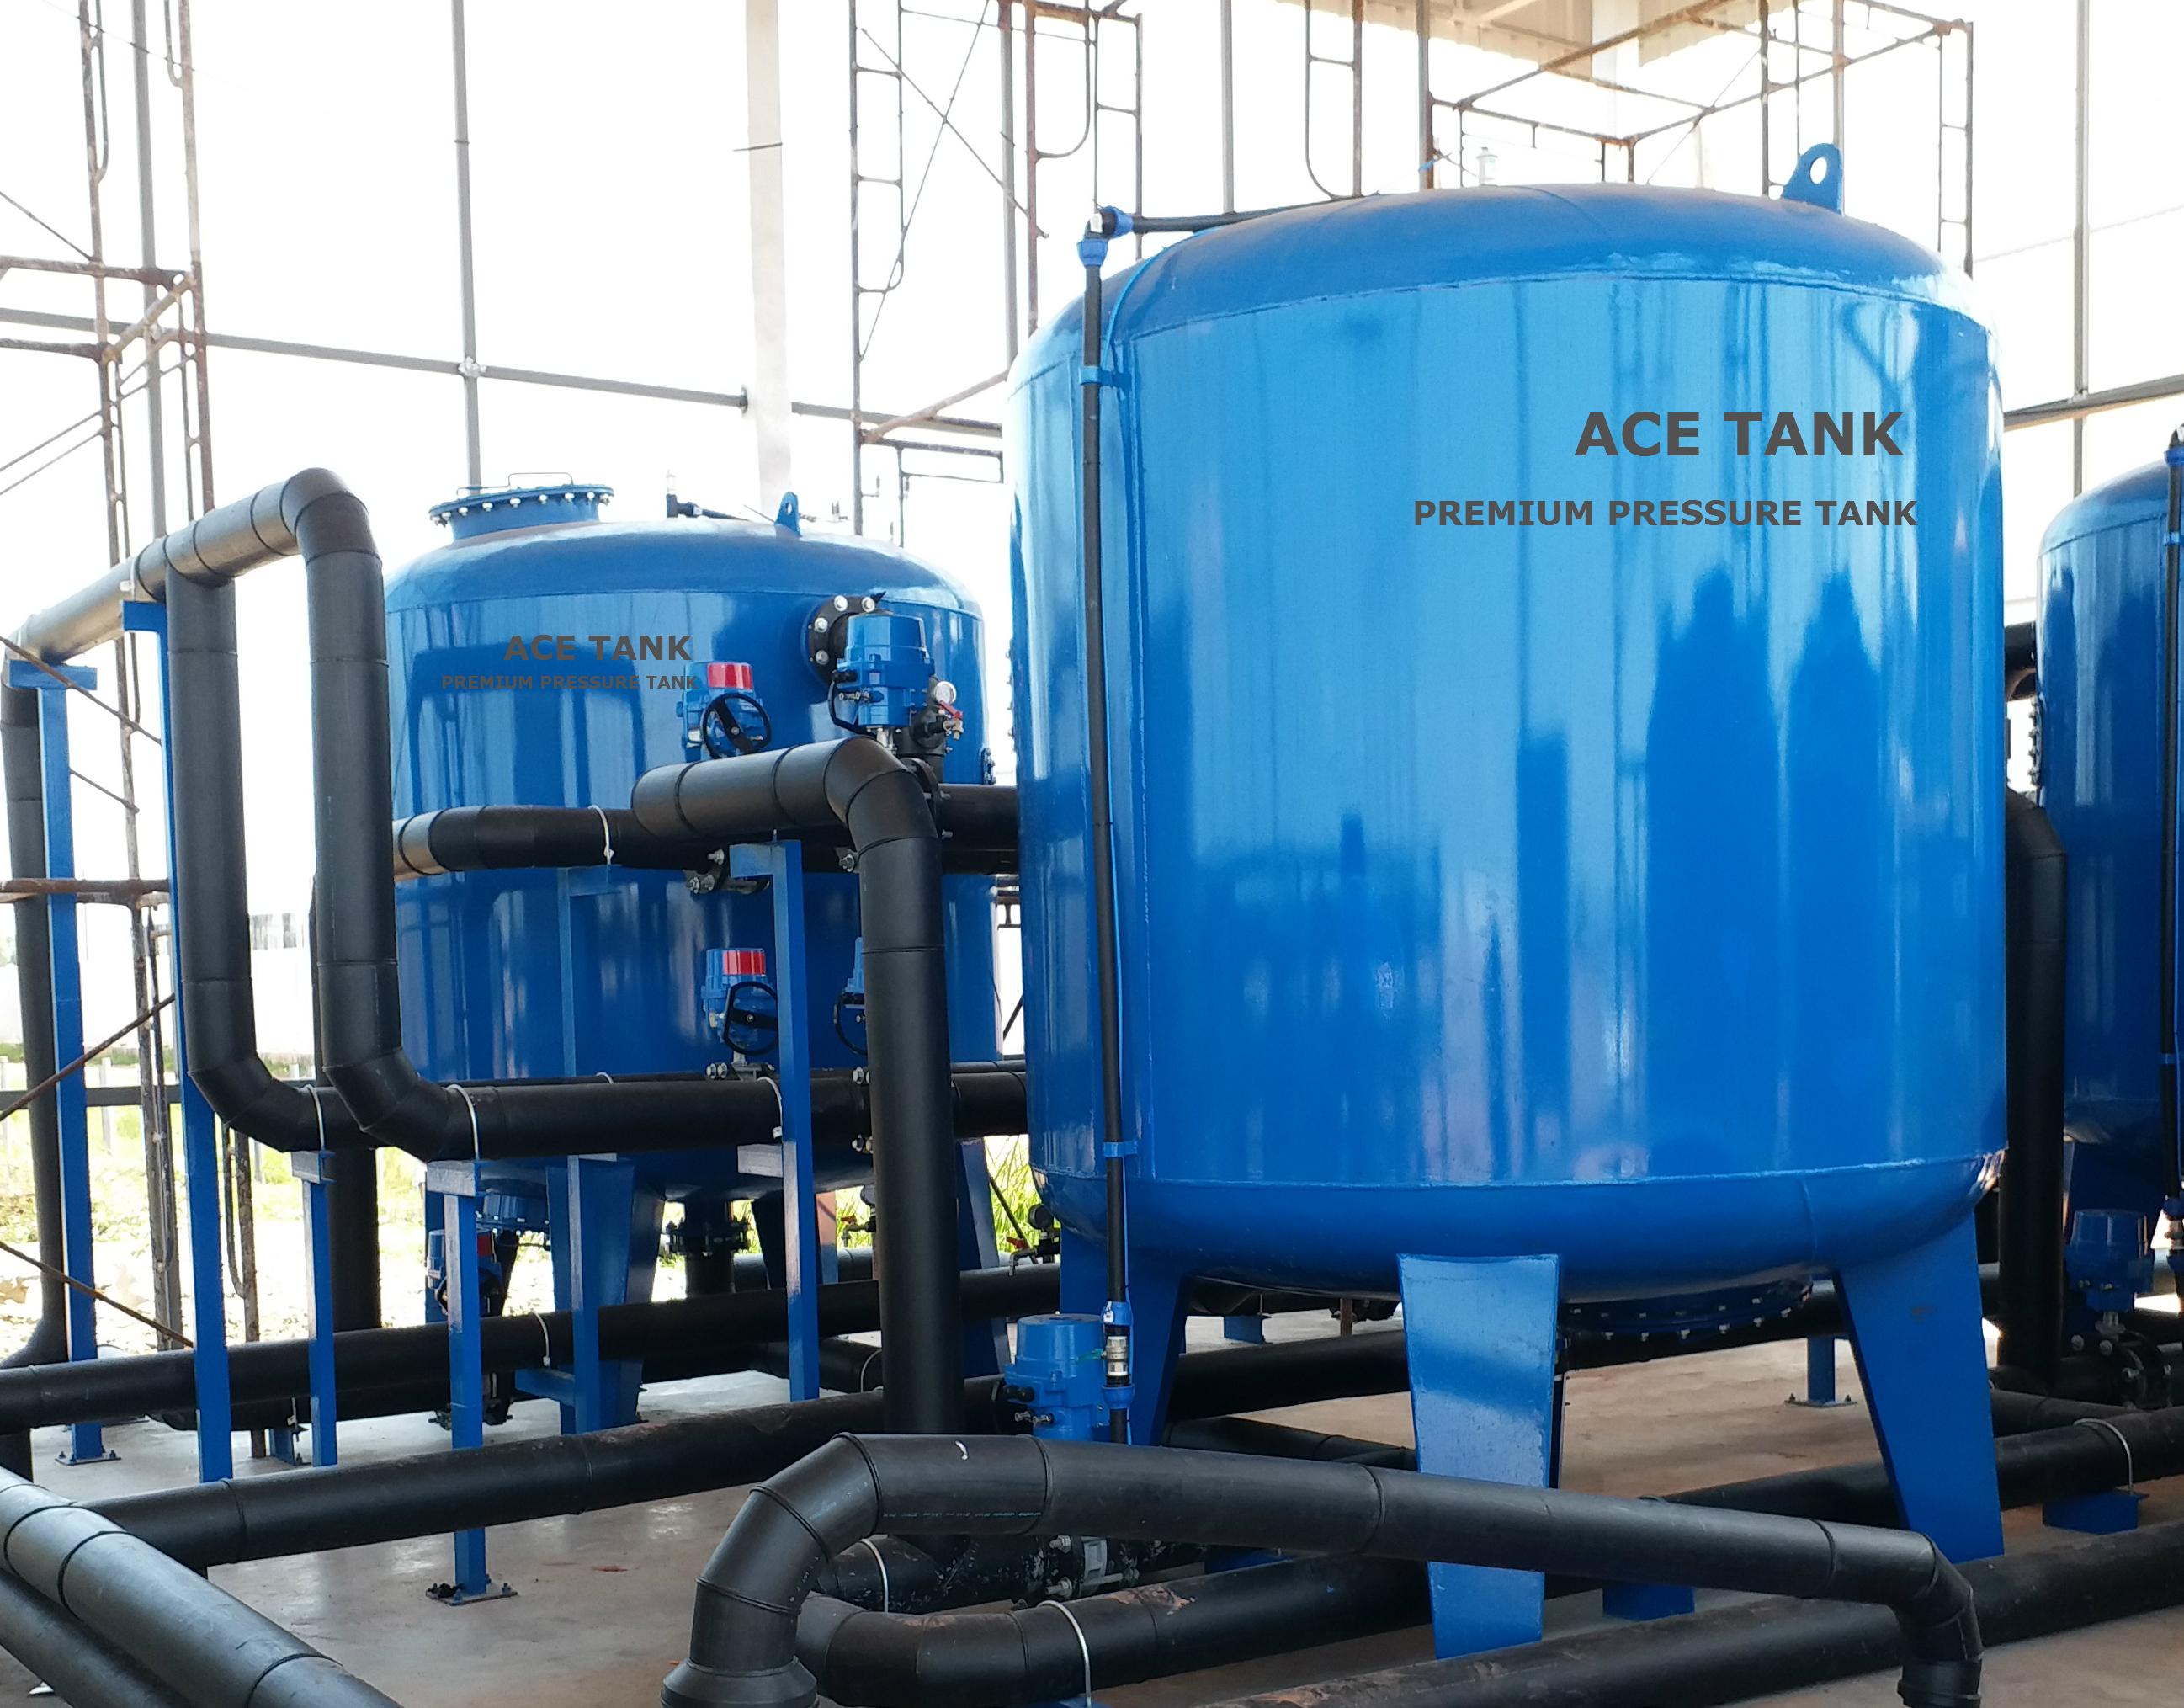 ace_pressure_tank___001